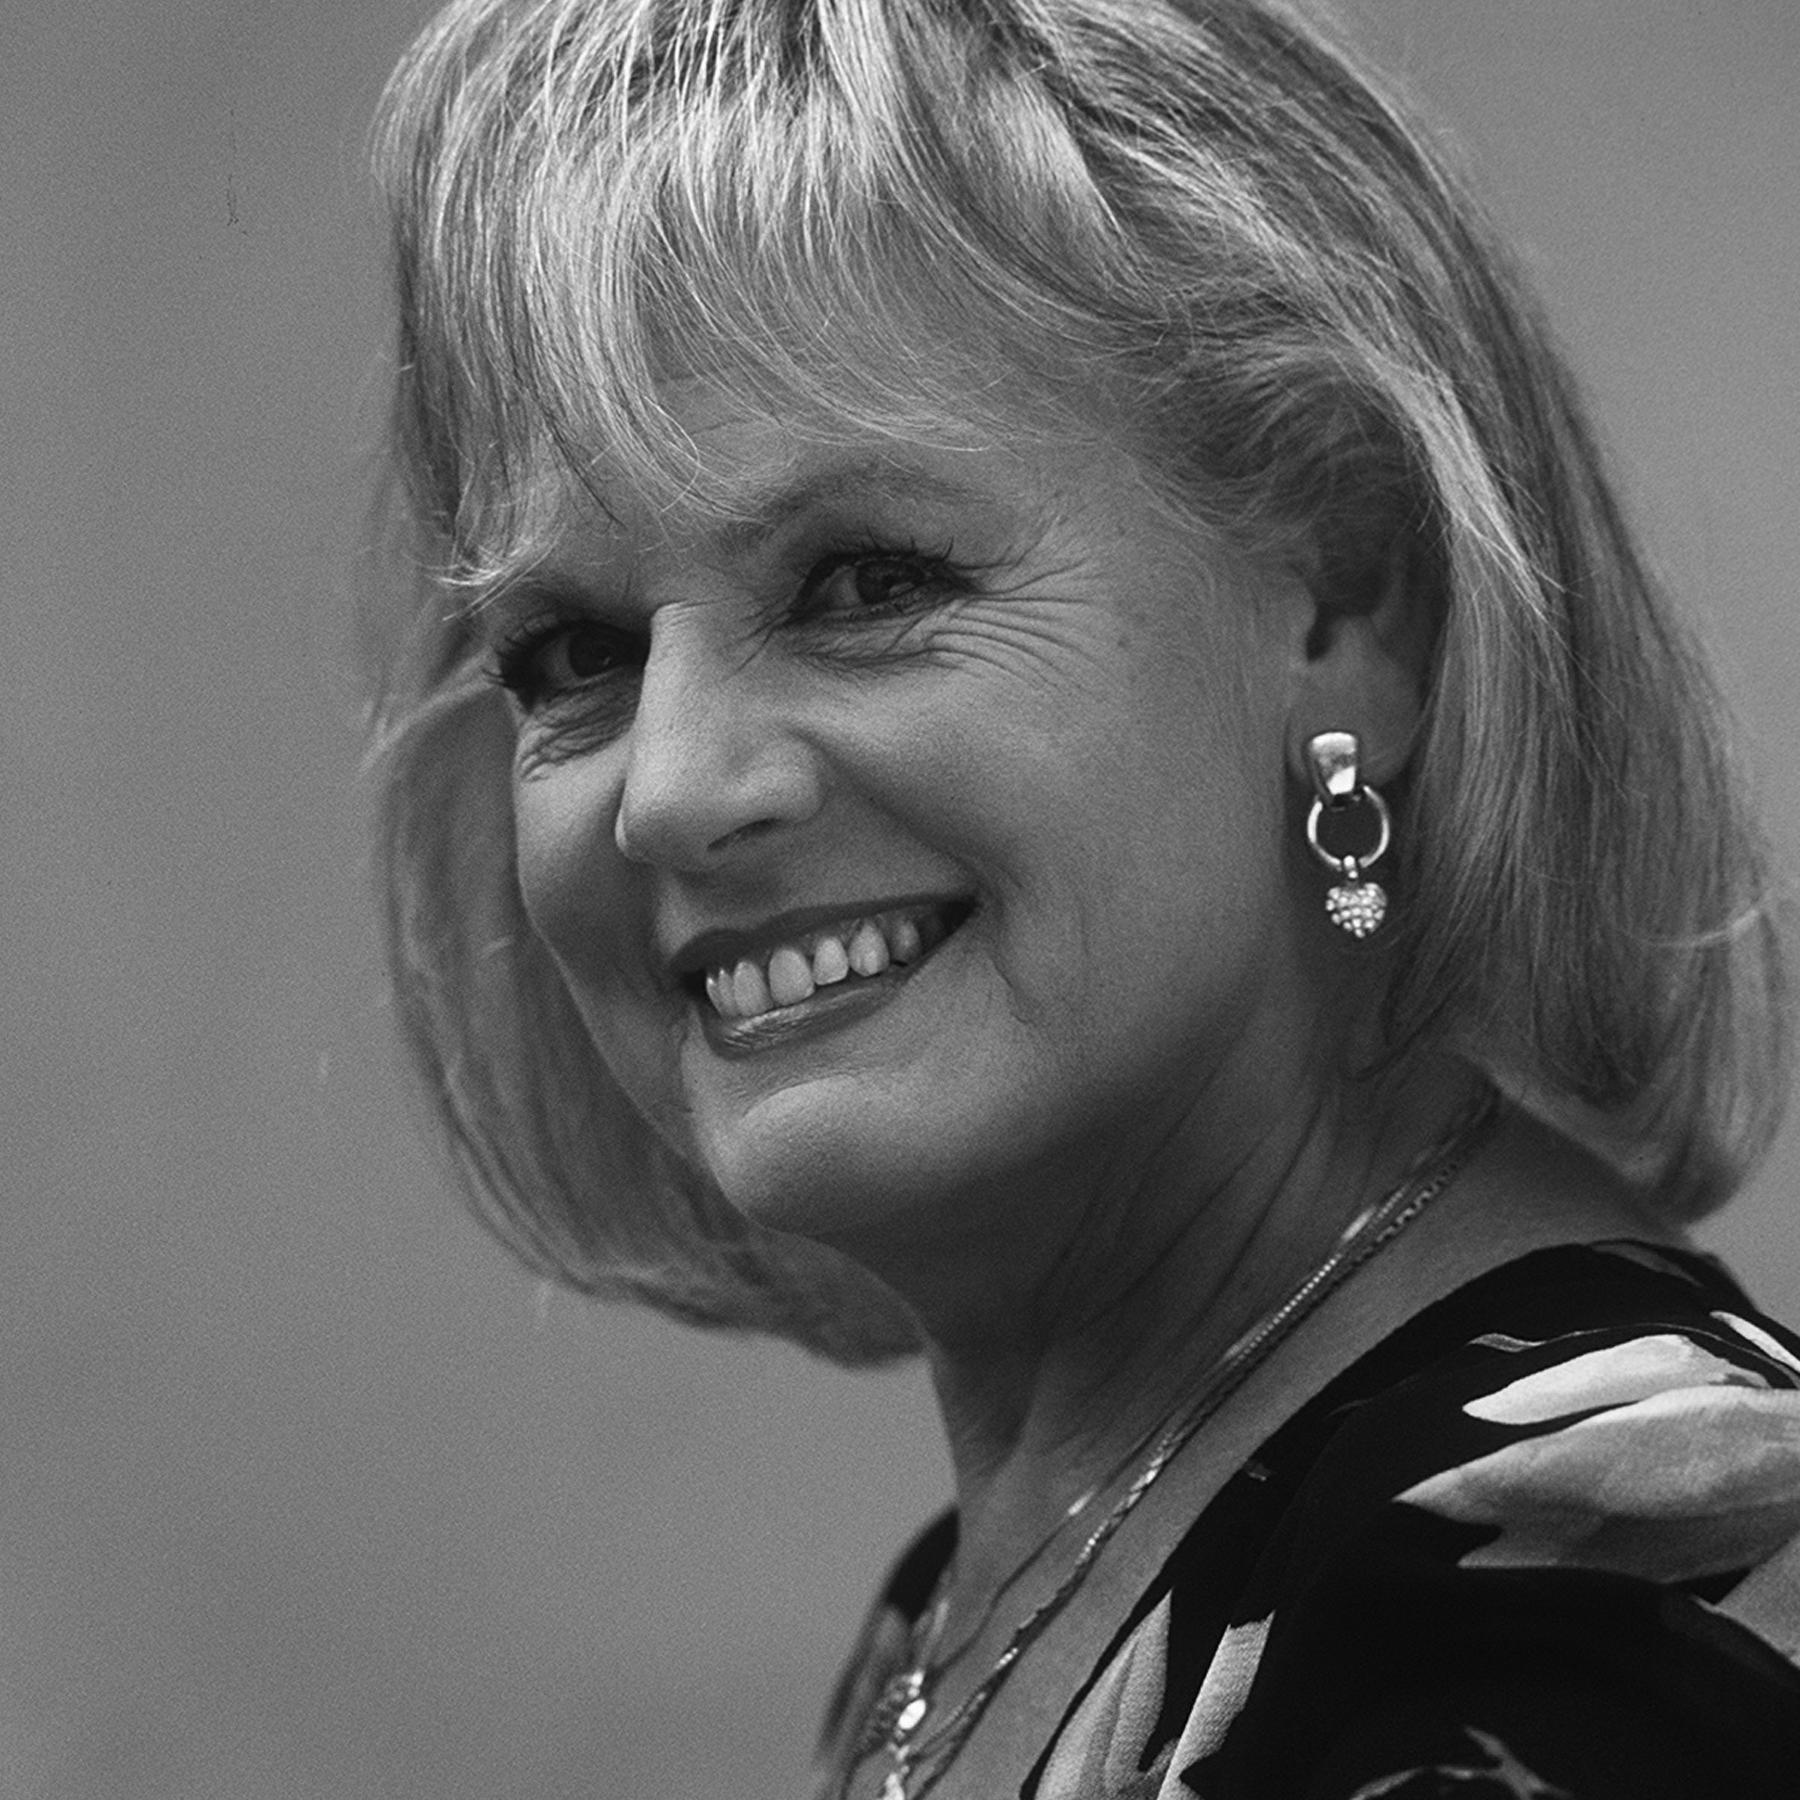 Ulla Norden WDR-Moderatorin in Krankenhaus verstorben